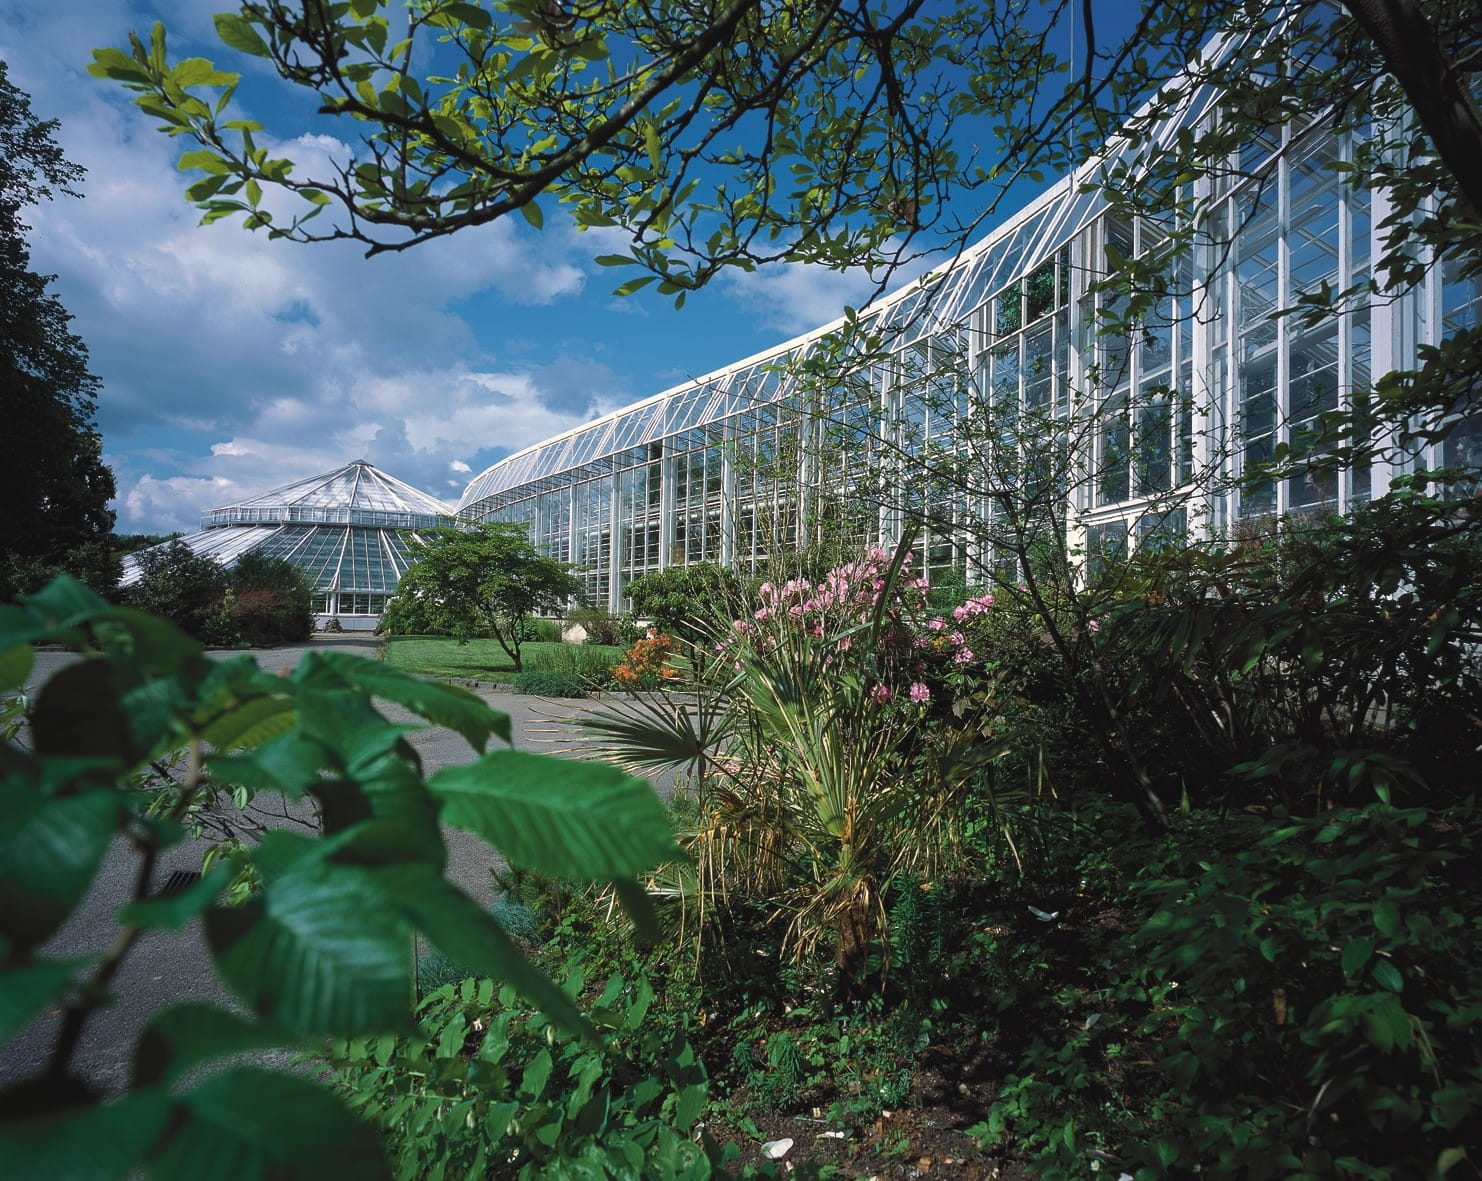 Væksthusene I Botanisk Have I Aarhus